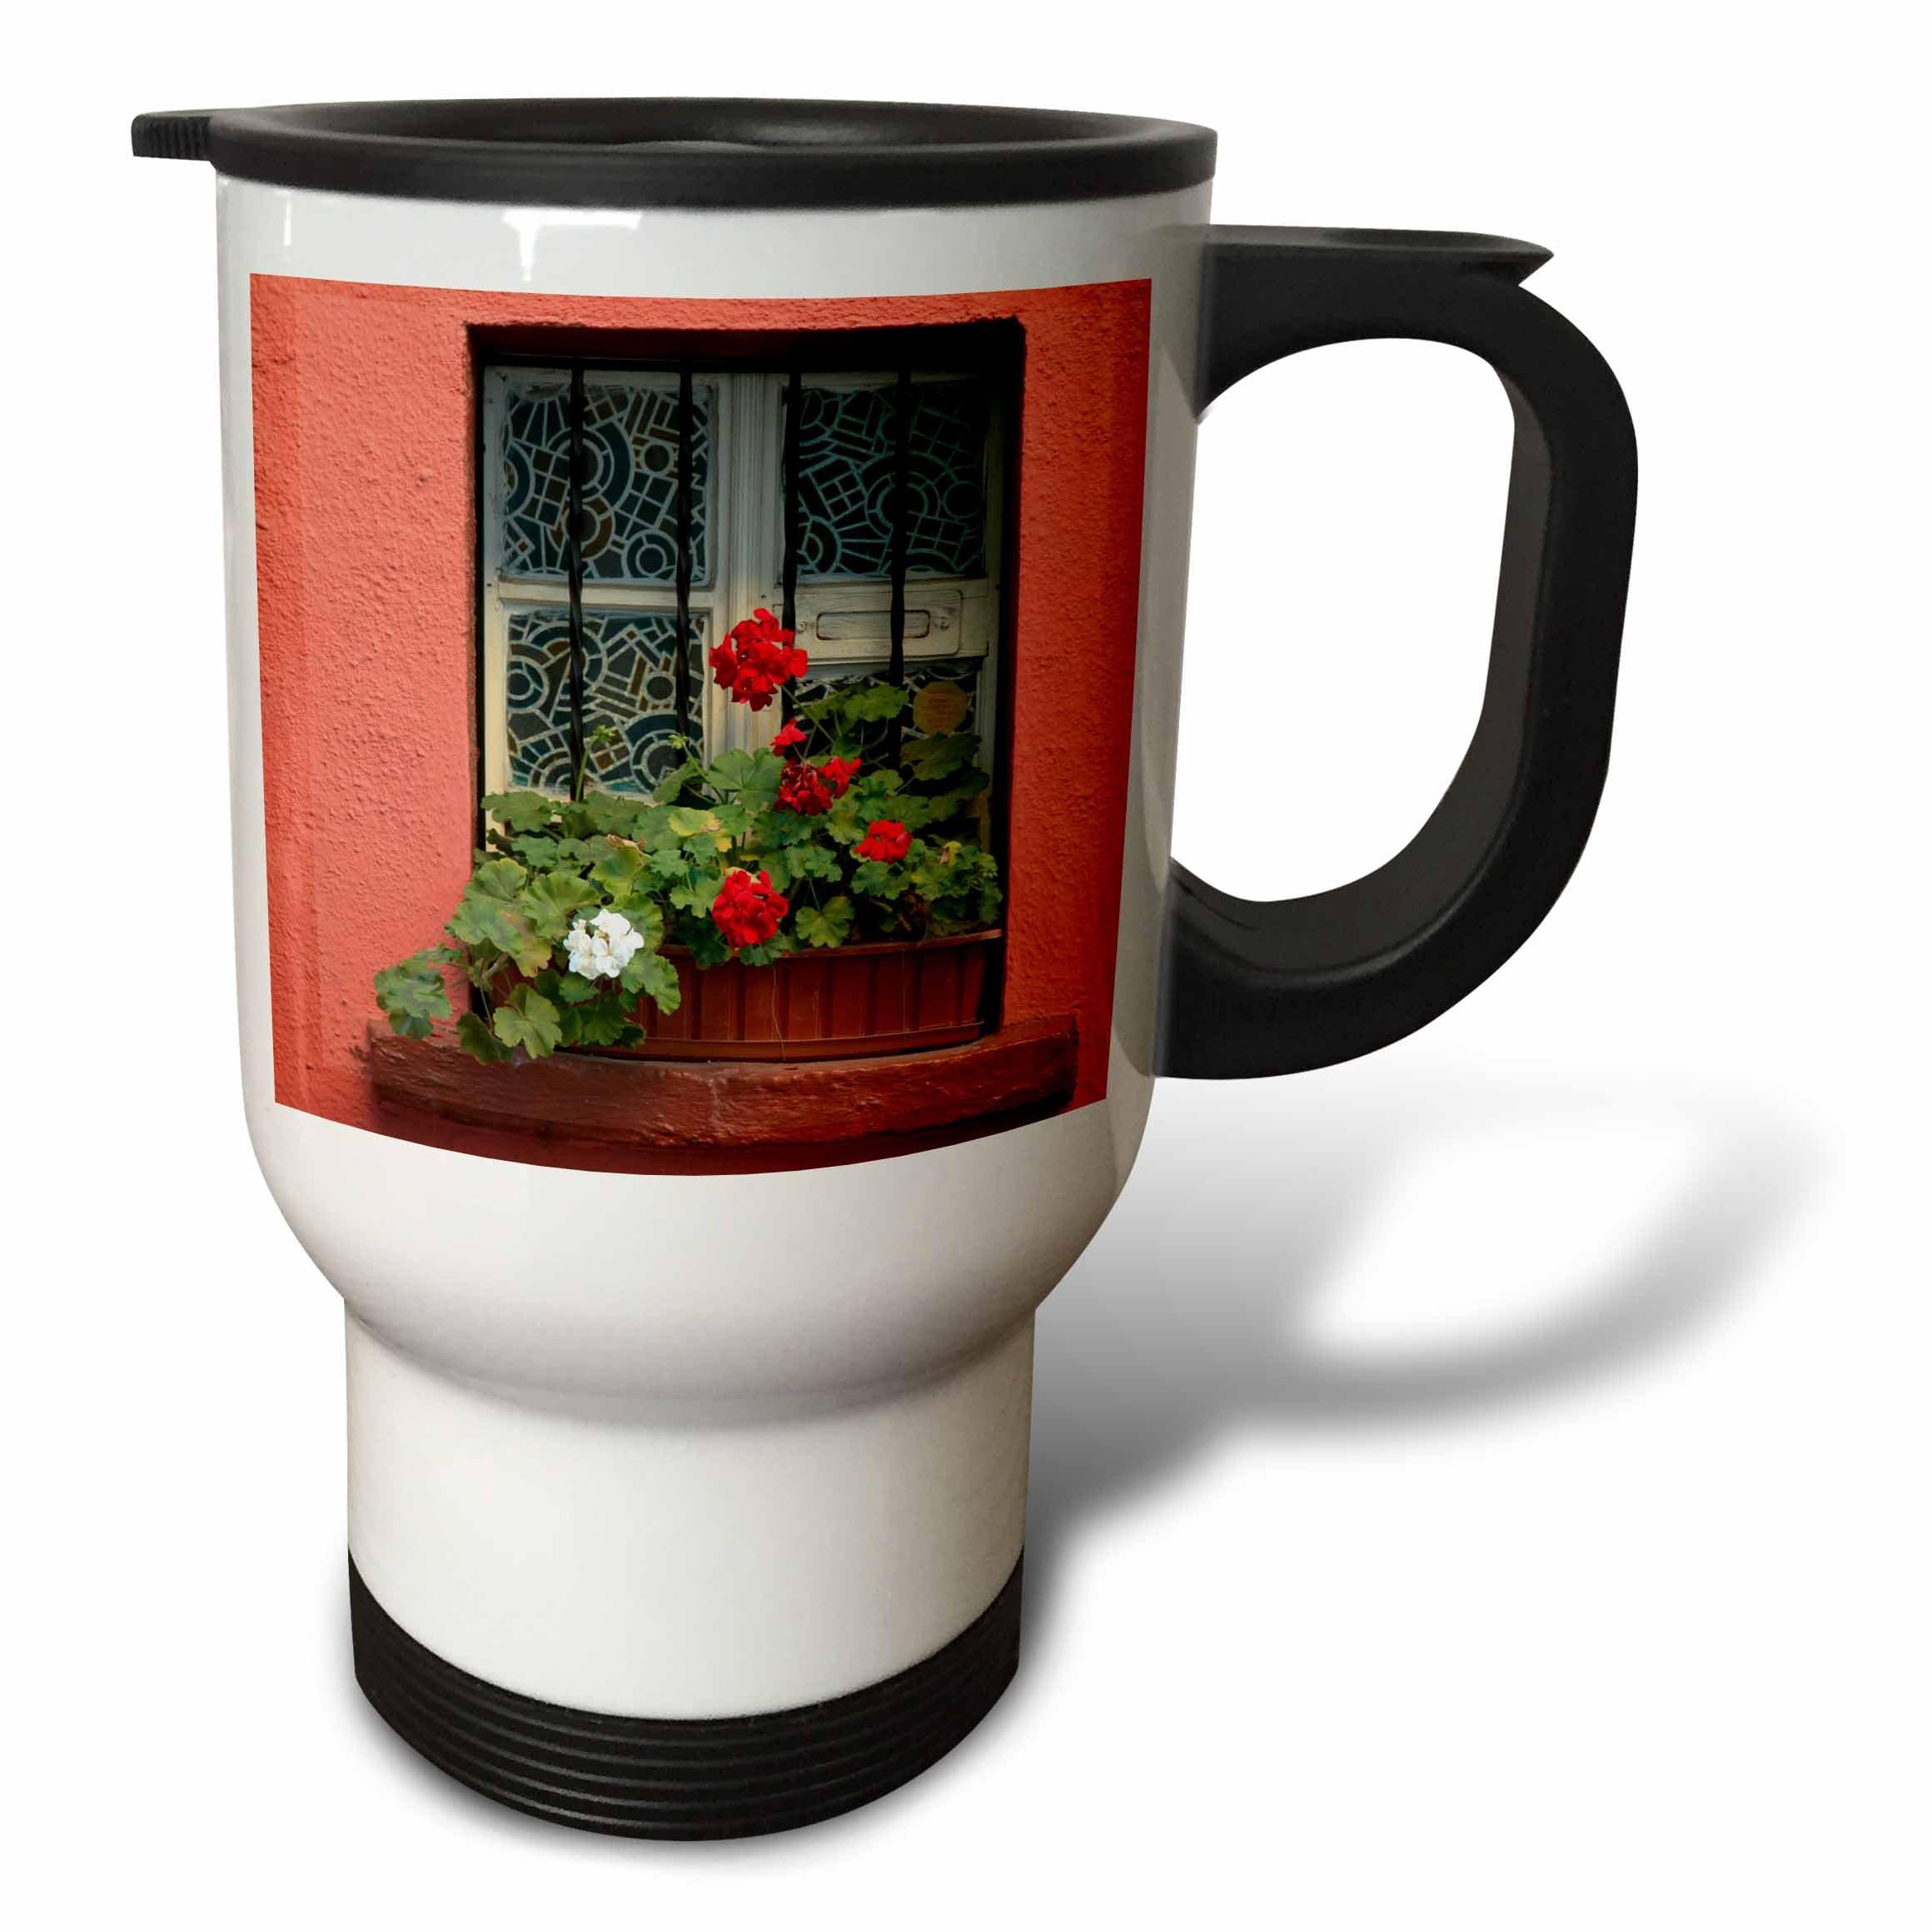 3dRose Danita Delimont - Flowers - Romania, Sighisoara, residential window in old town. Flowers in window - 14oz Stainless Steel Travel Mug (tm_277872_1)